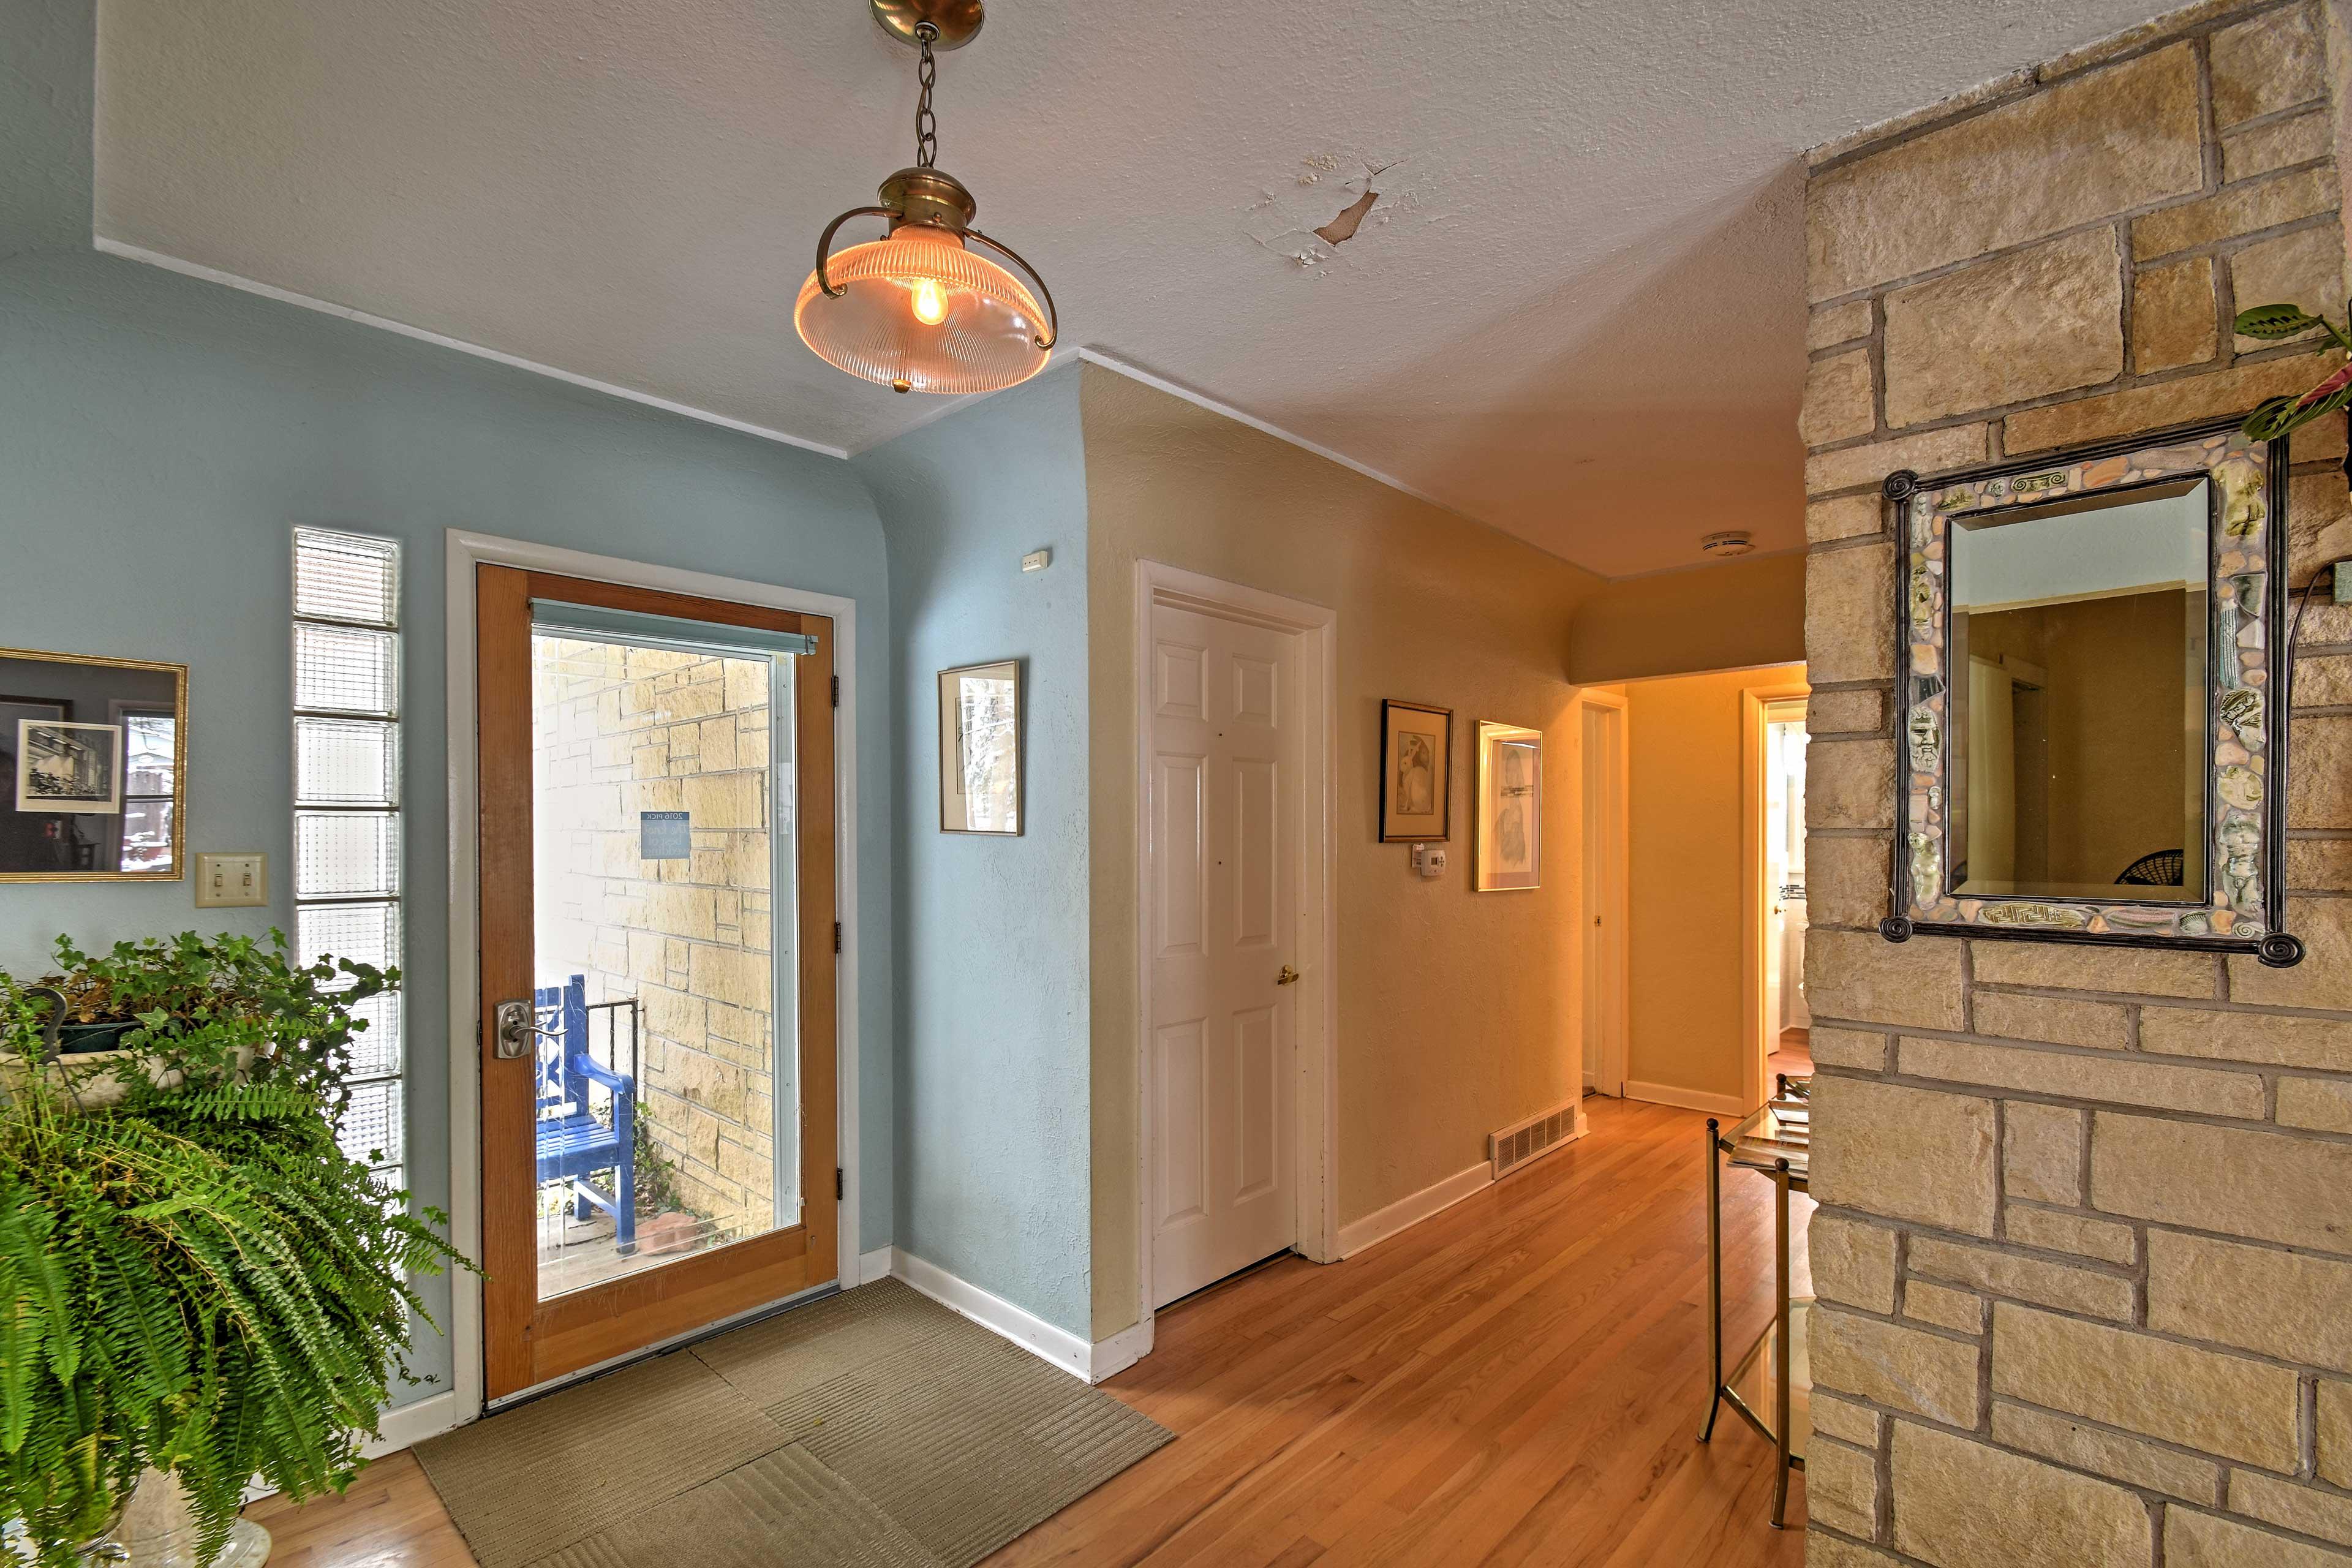 Beautiful hardwood floors line all the common living areas.